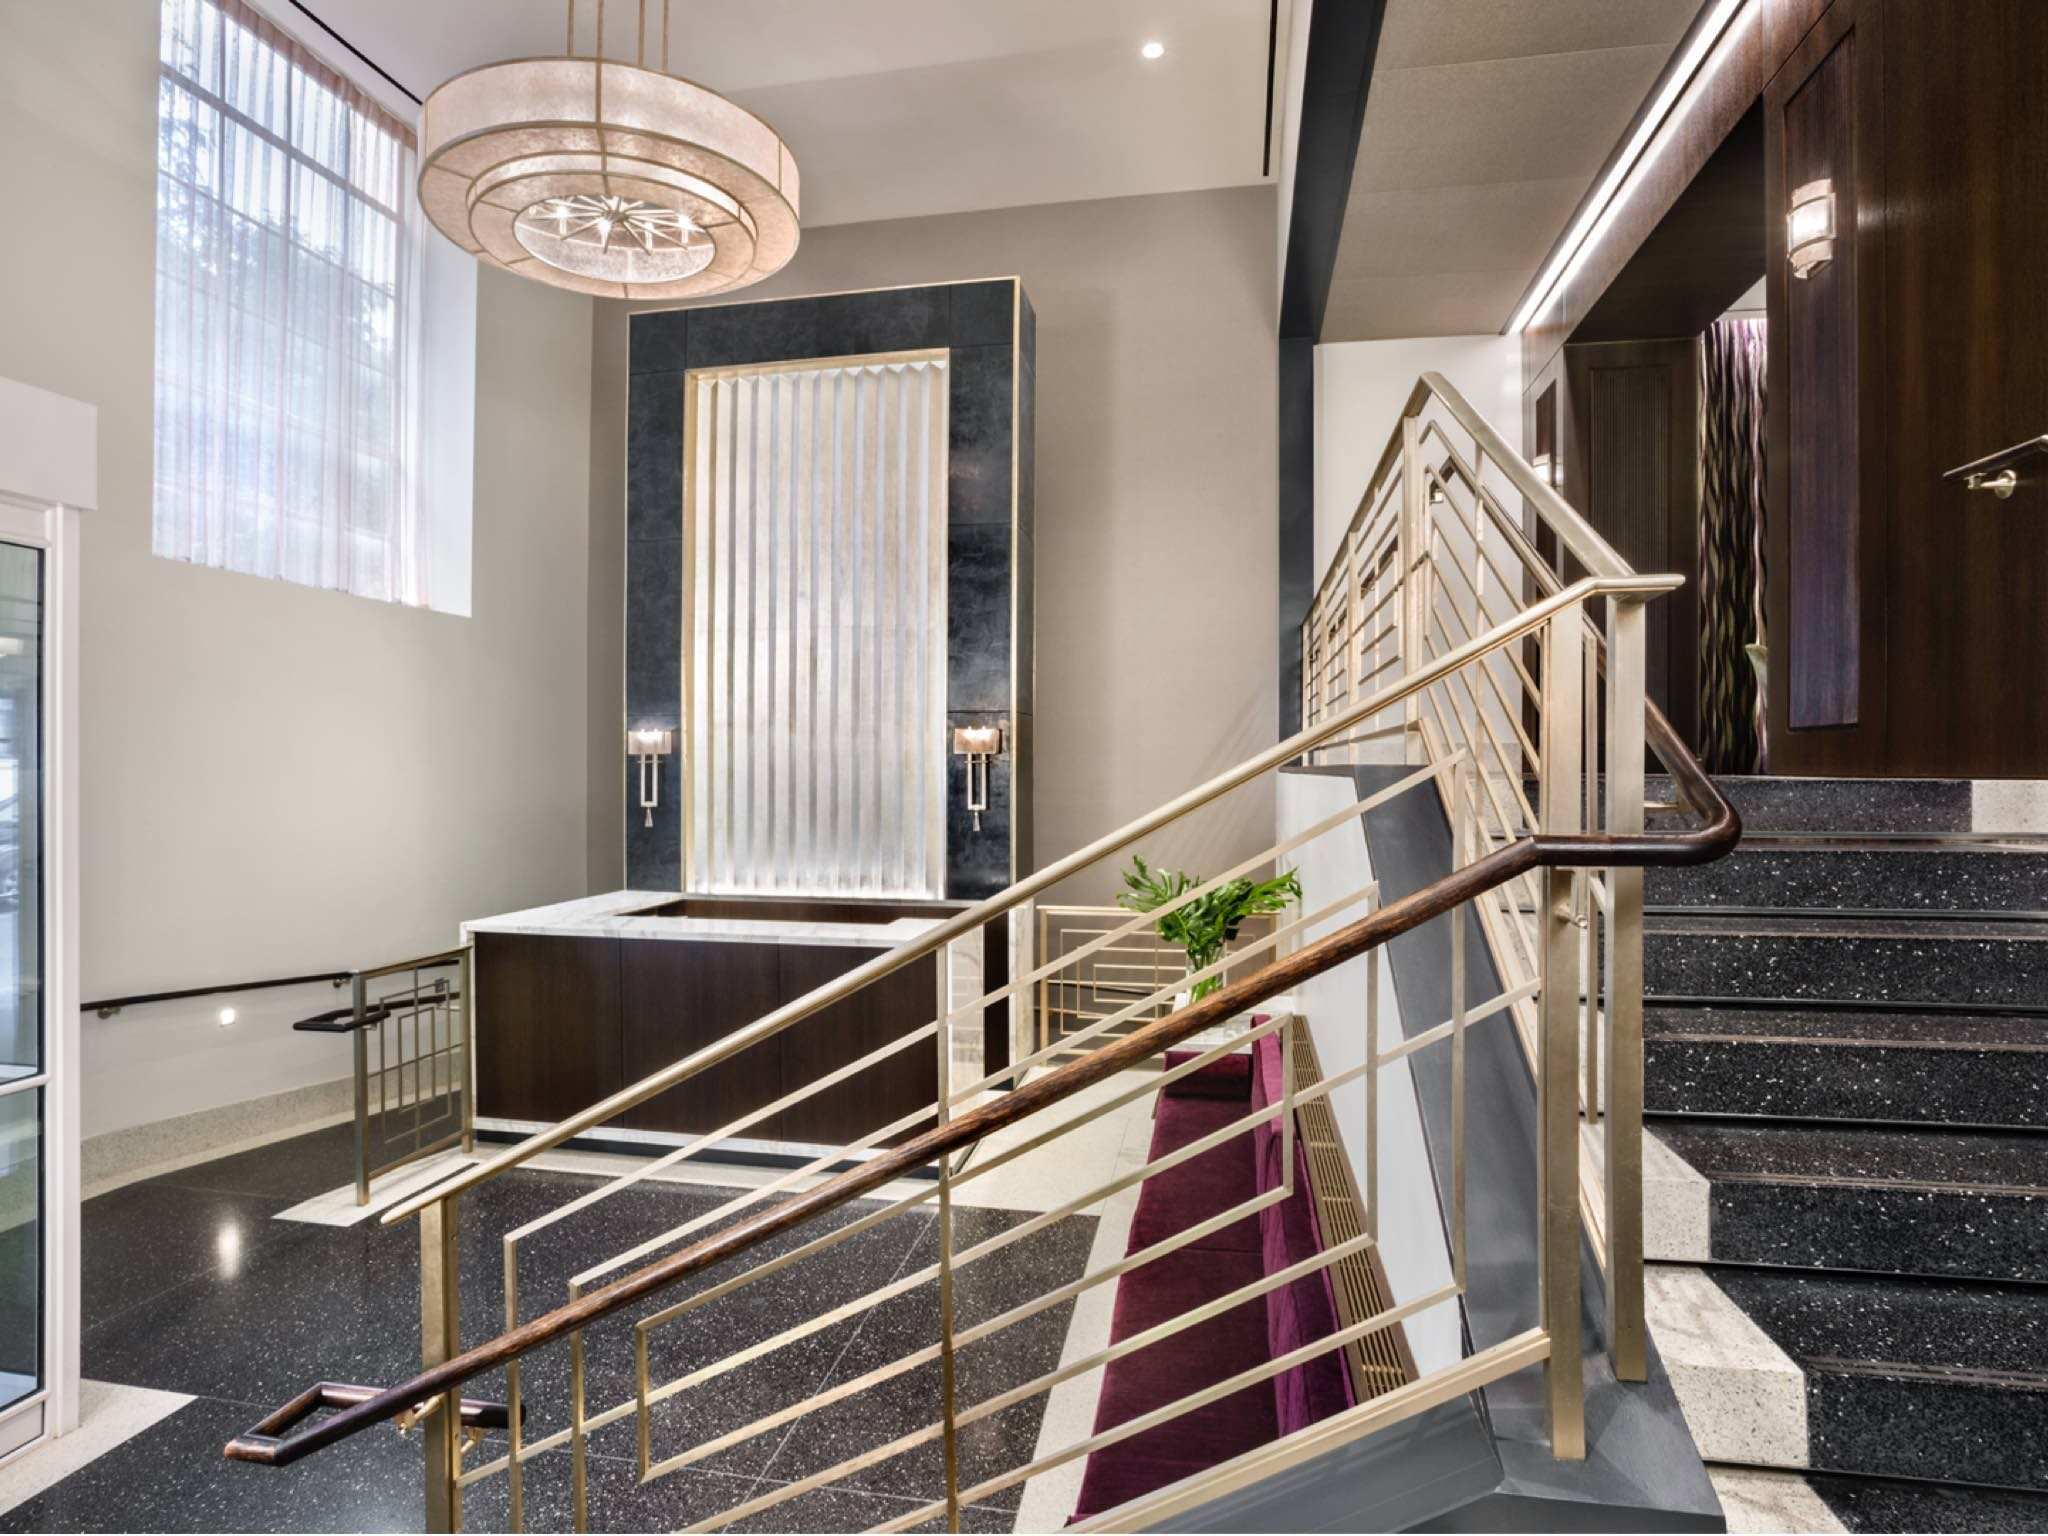 Hotel St. George Lobby